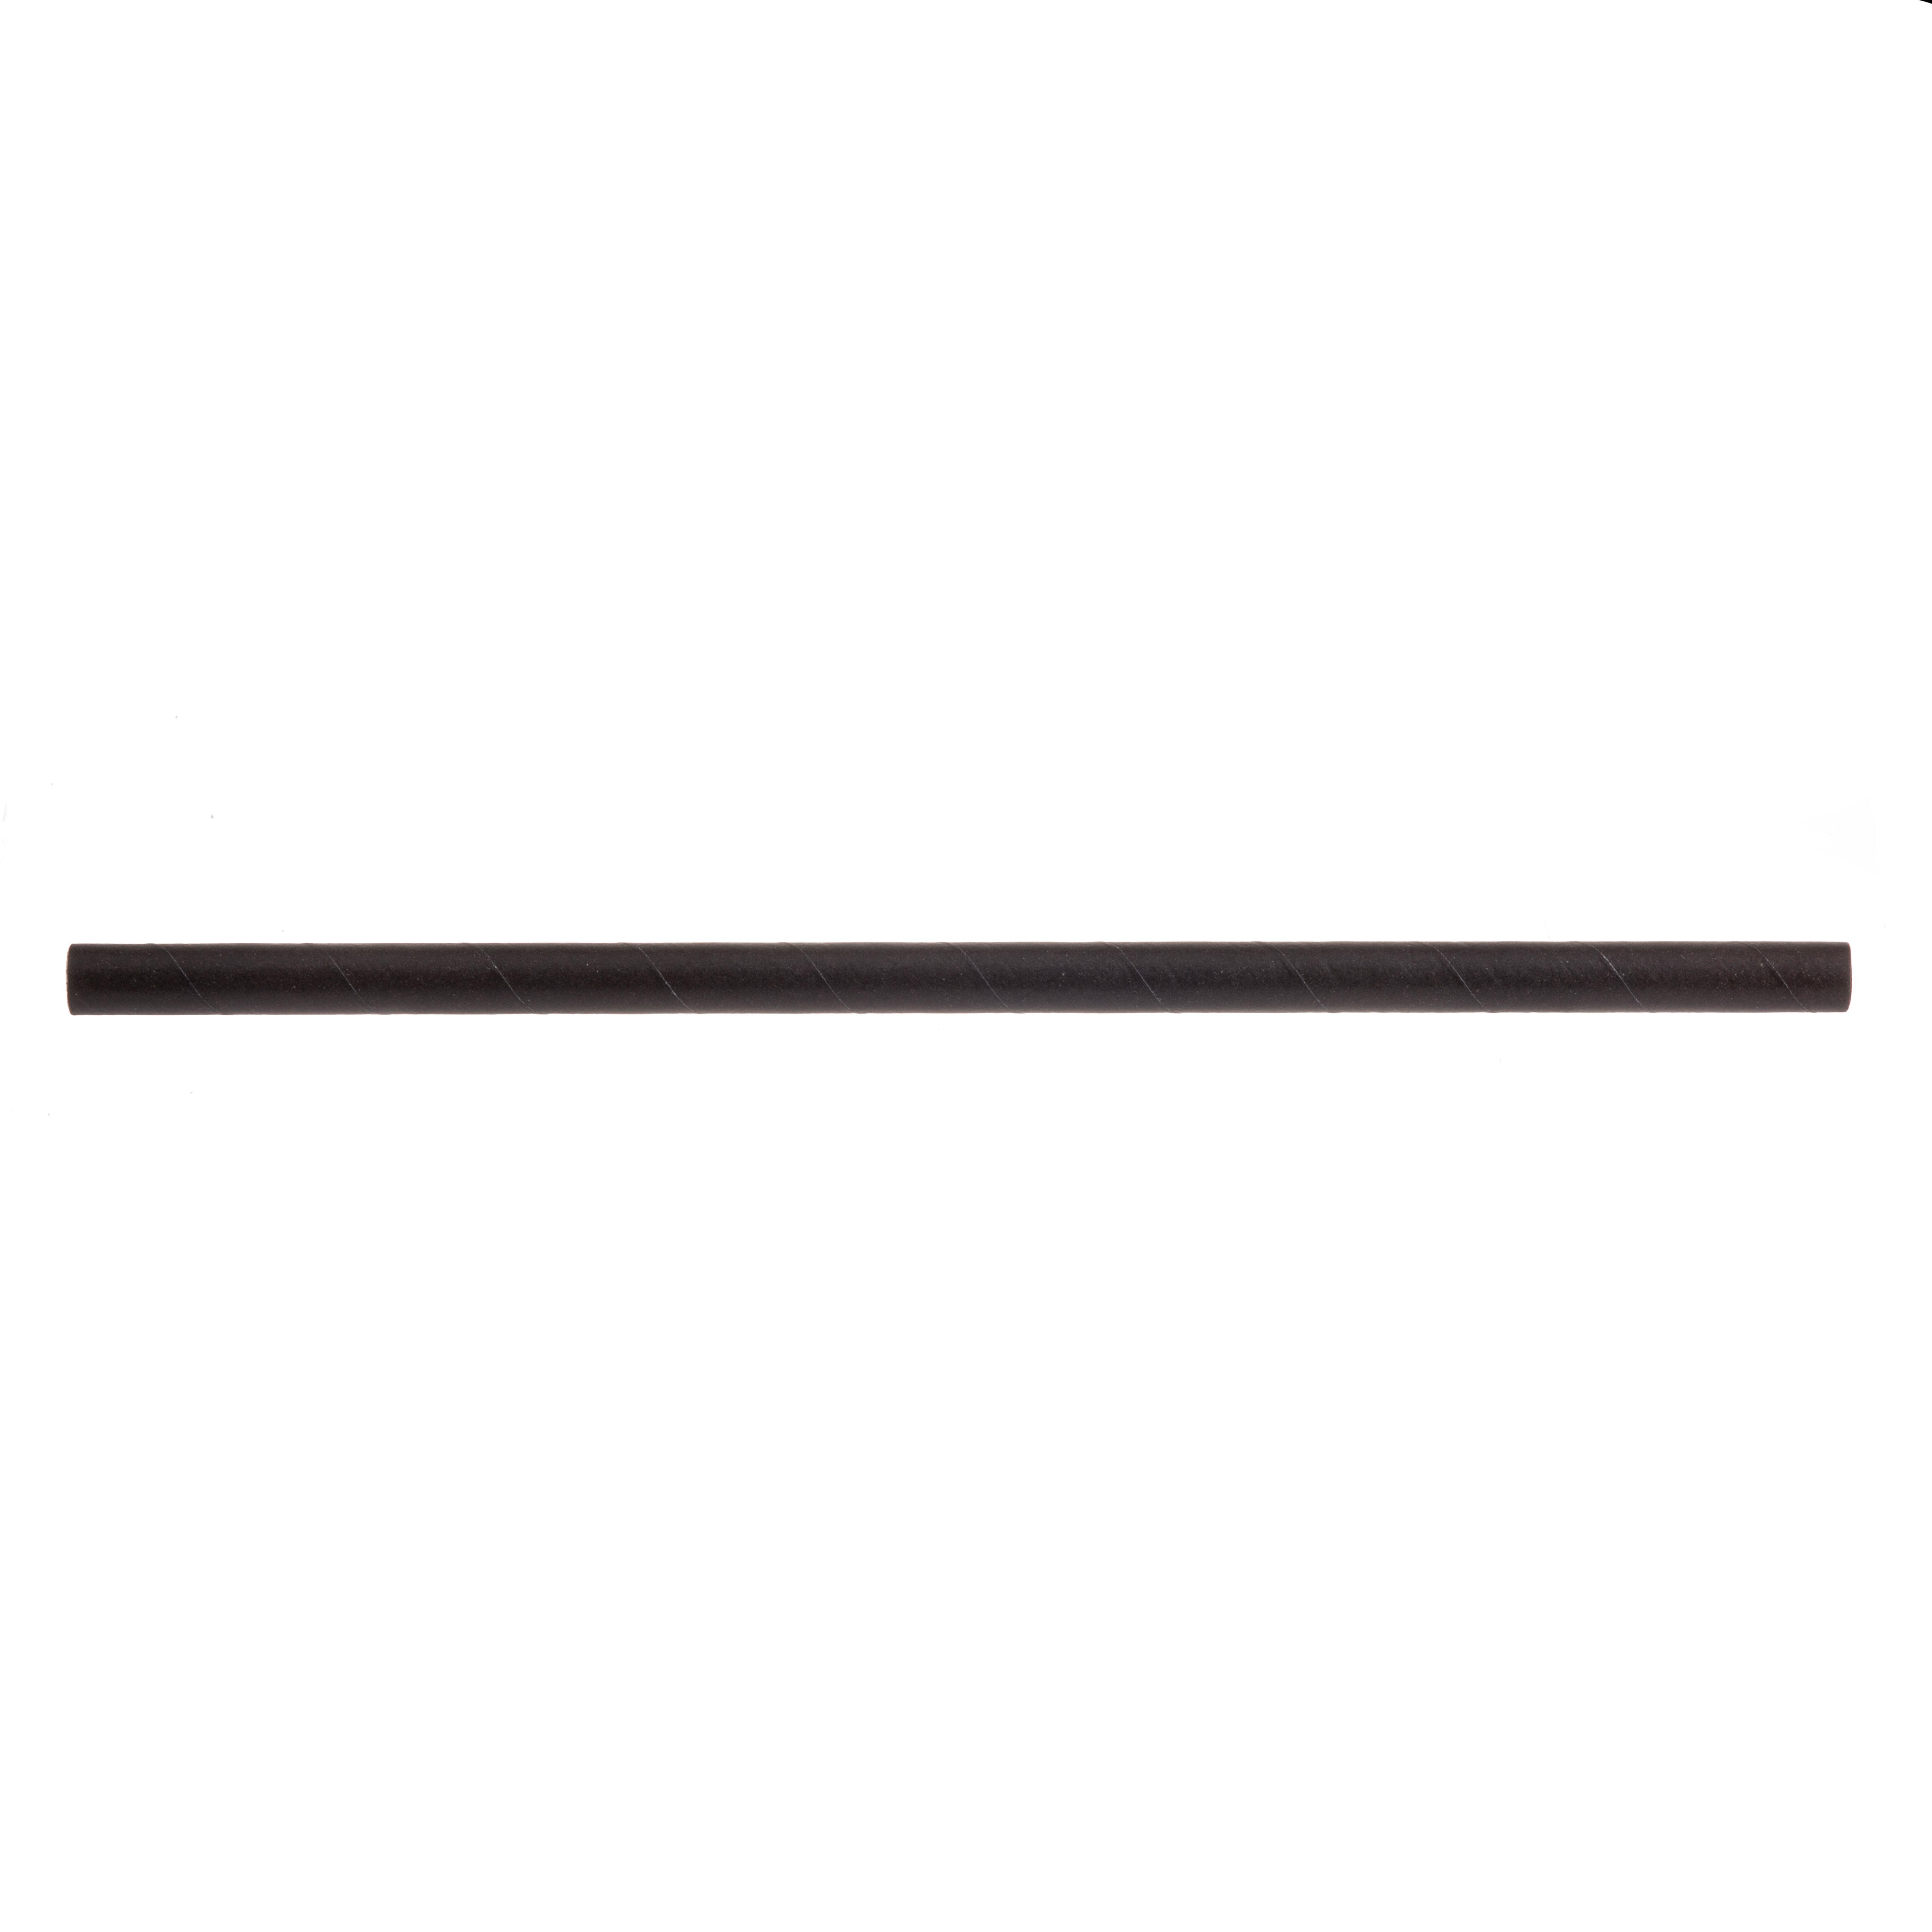 TableCraft Products 700135 straws